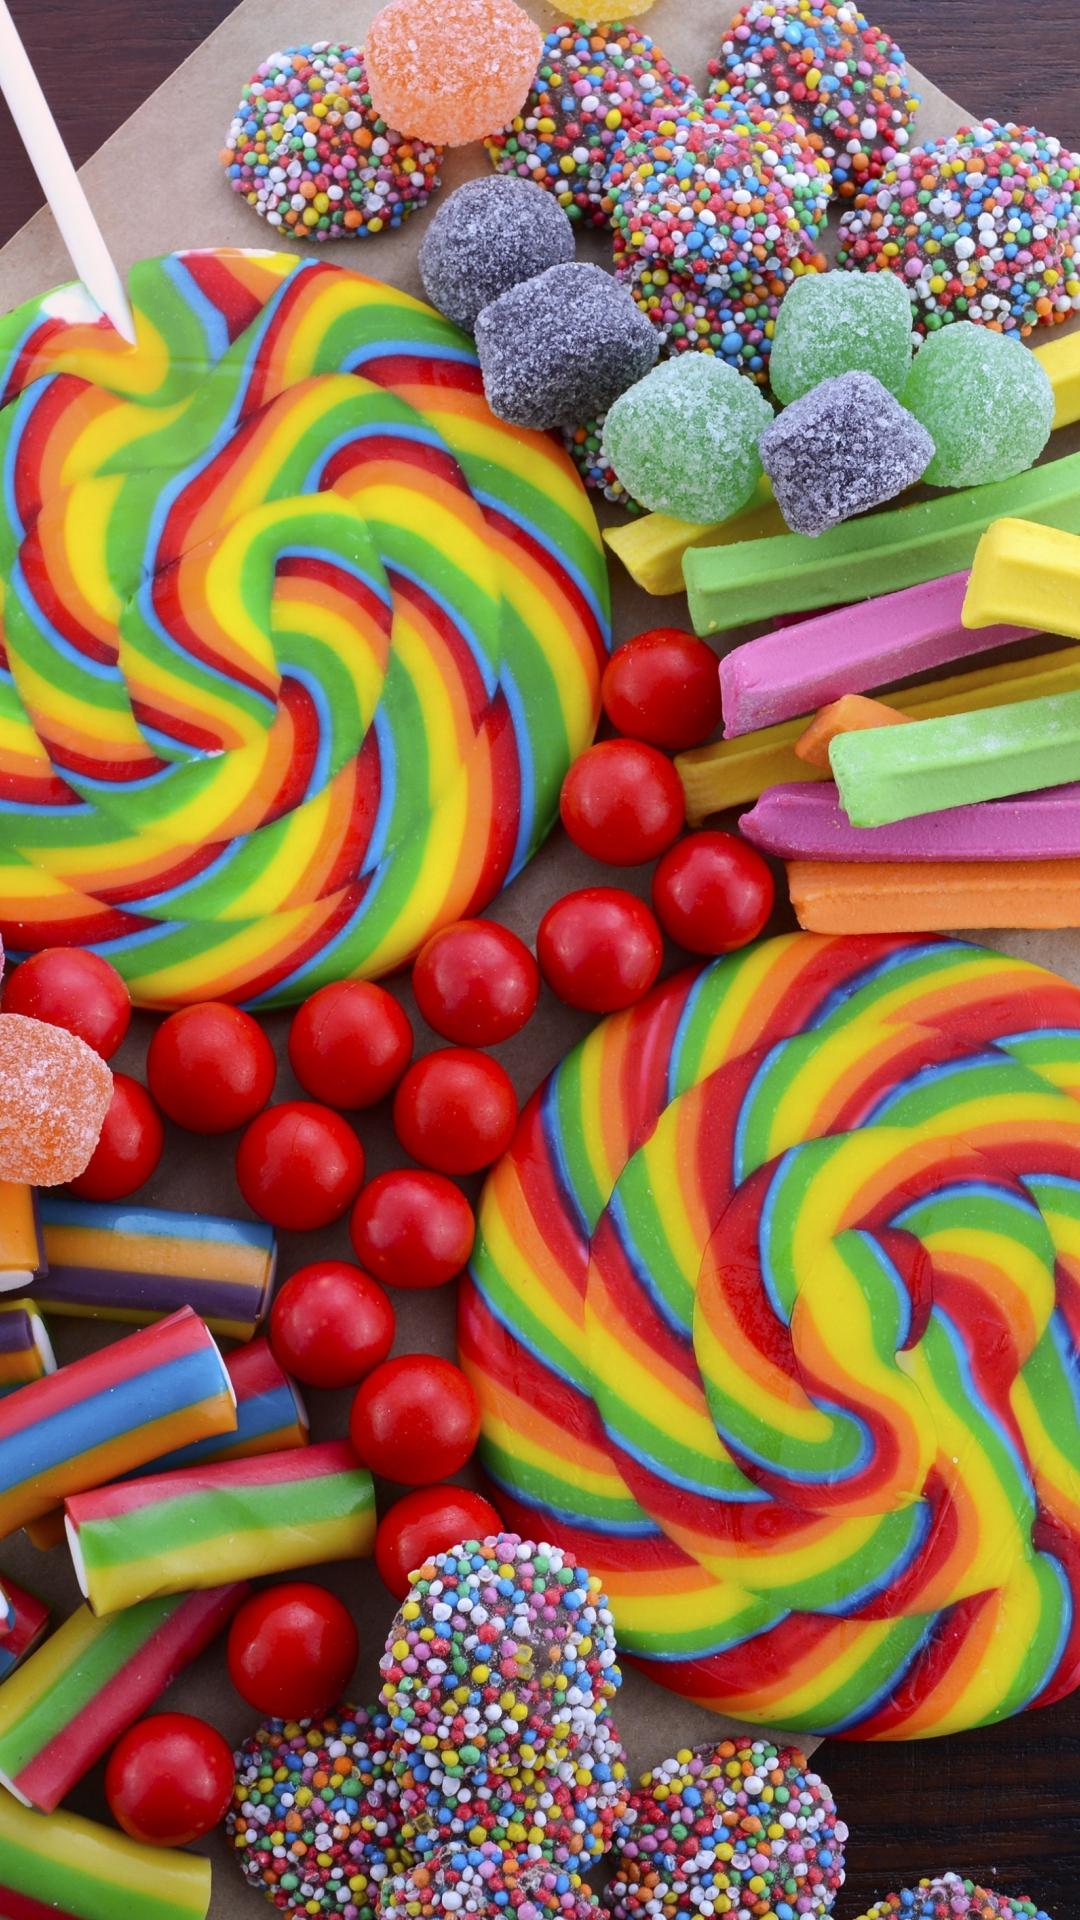 Download 1080x1920 Wallpaper Colorful, Lollipop, Candies, Sweets, 4k